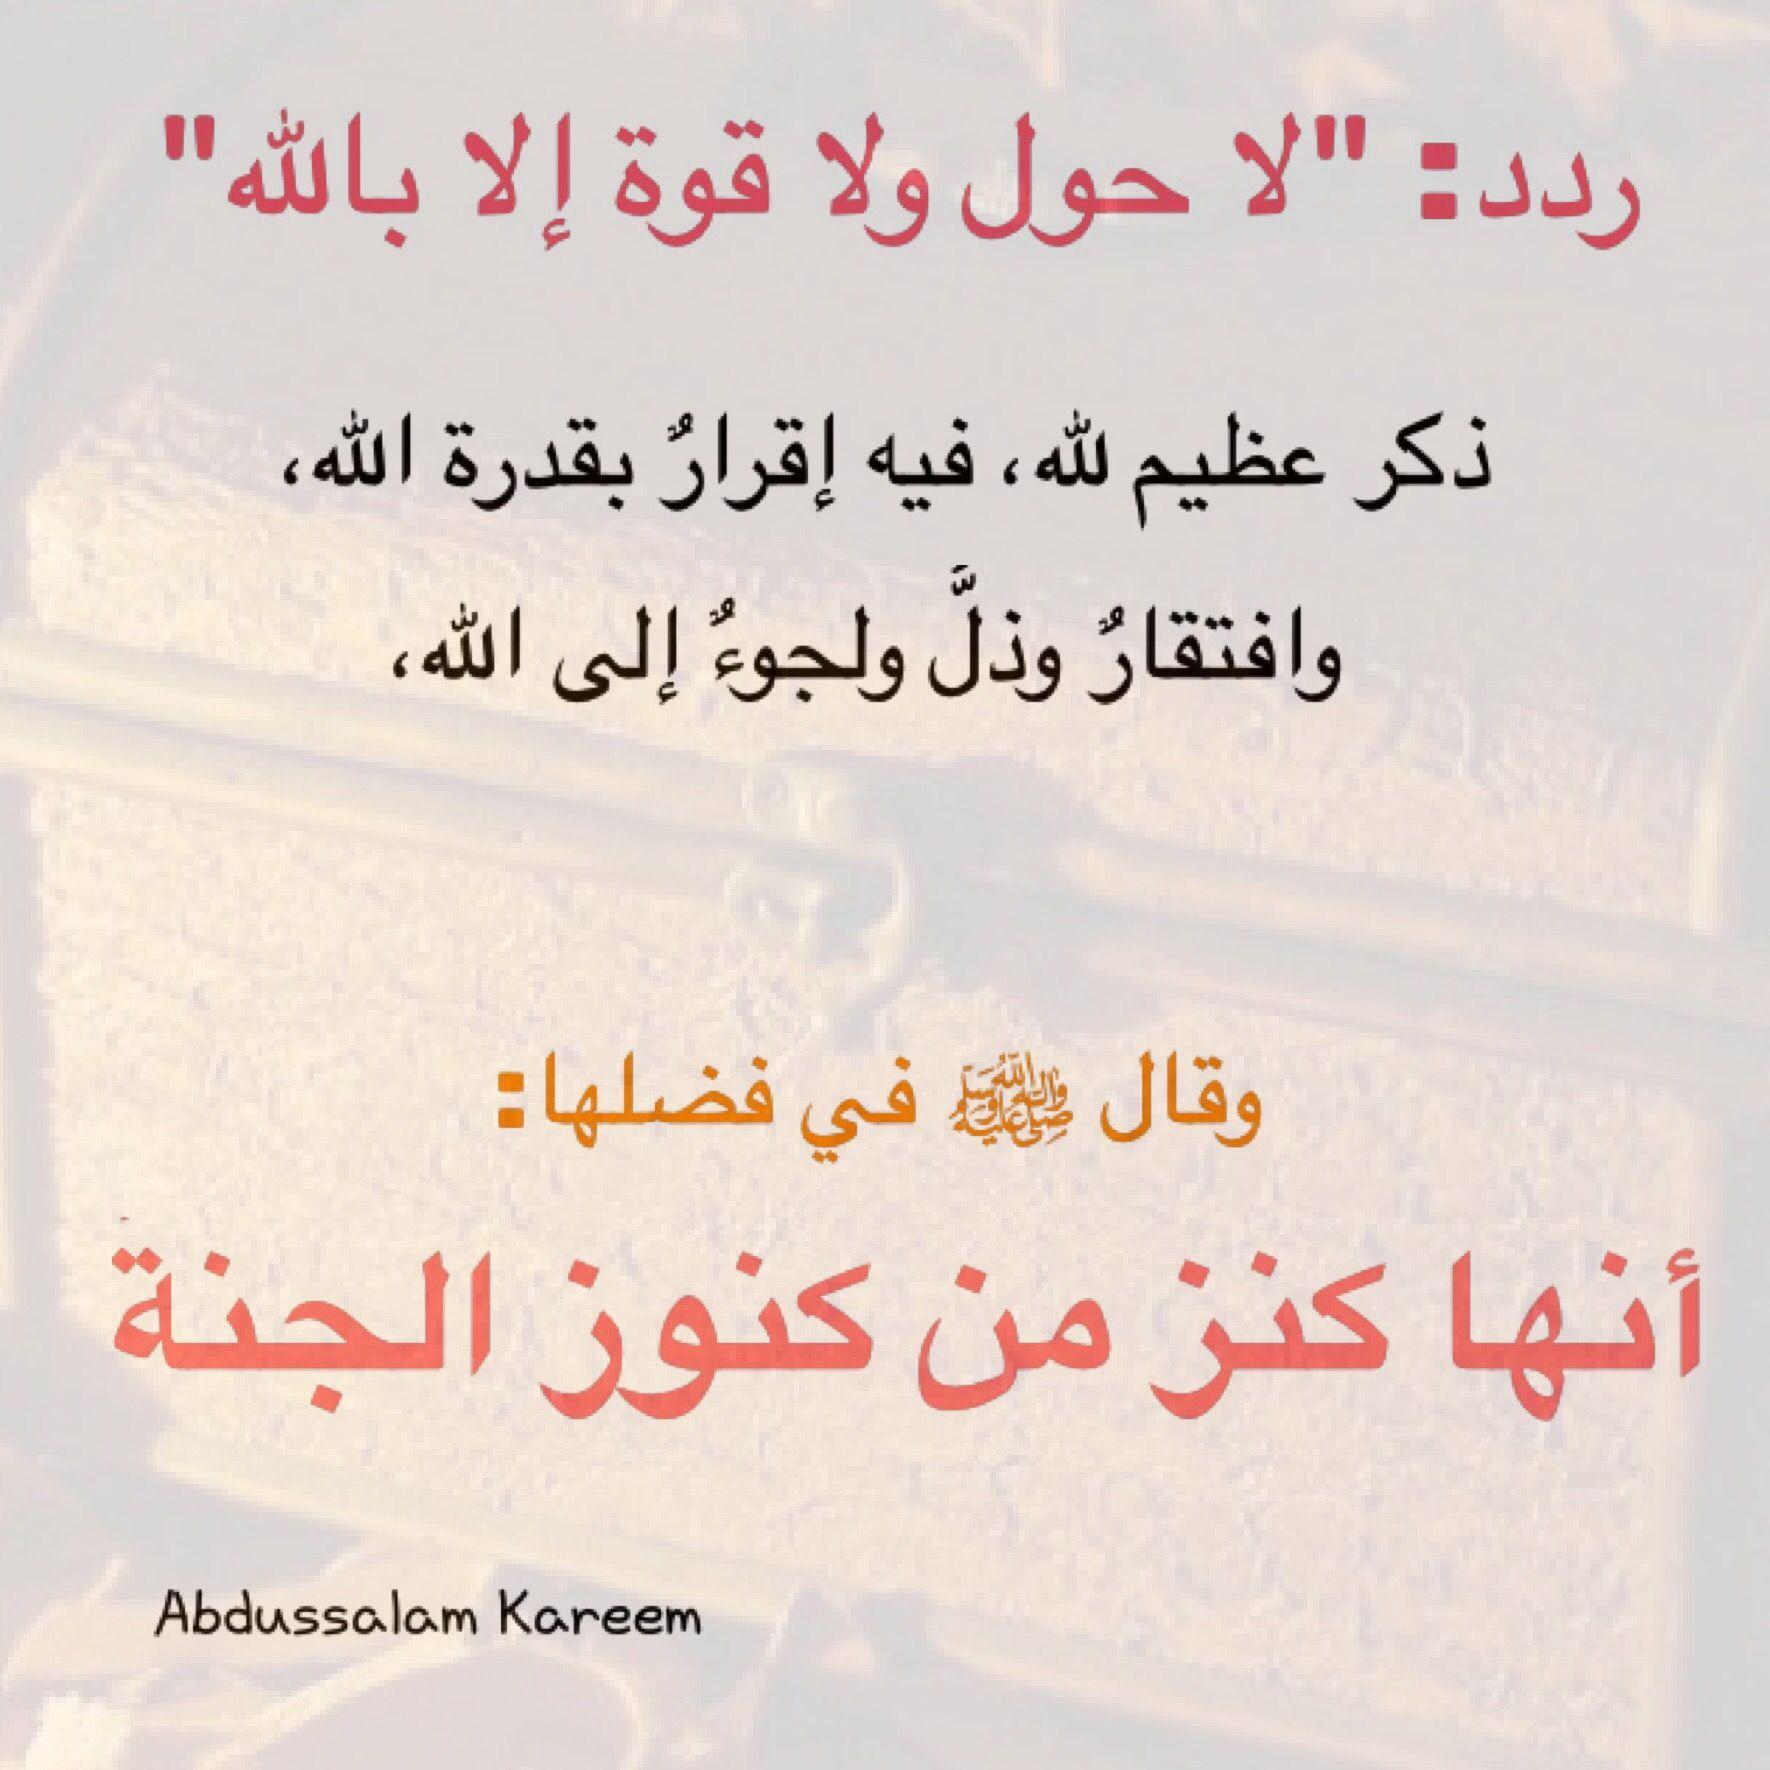 لا حول ولا قوة إلا بالله Peace Arabic Calligraphy Calligraphy